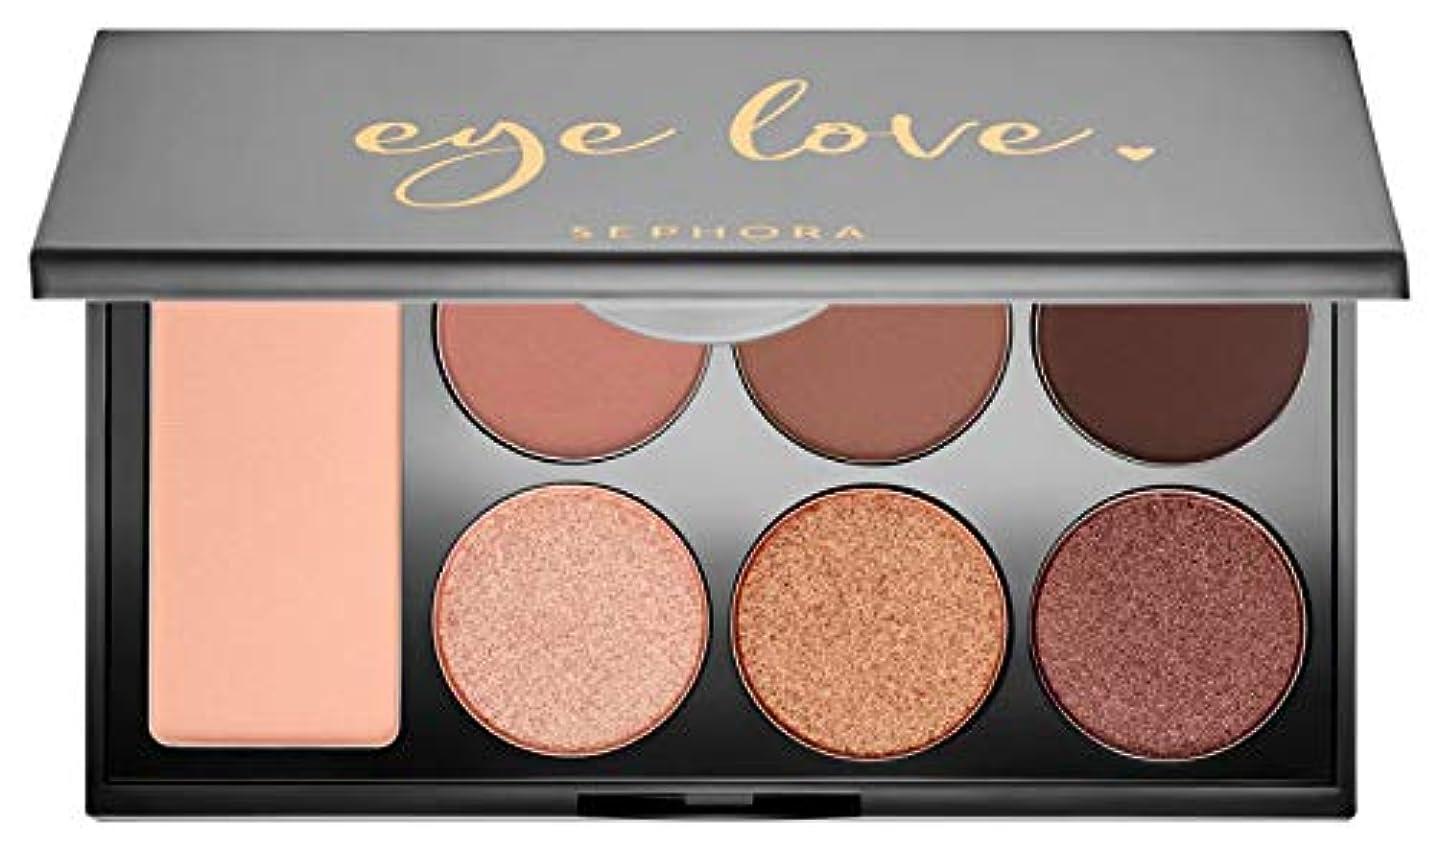 Sephora Collection Eye Love Eyeshadow Palette in MEDIUM COOL